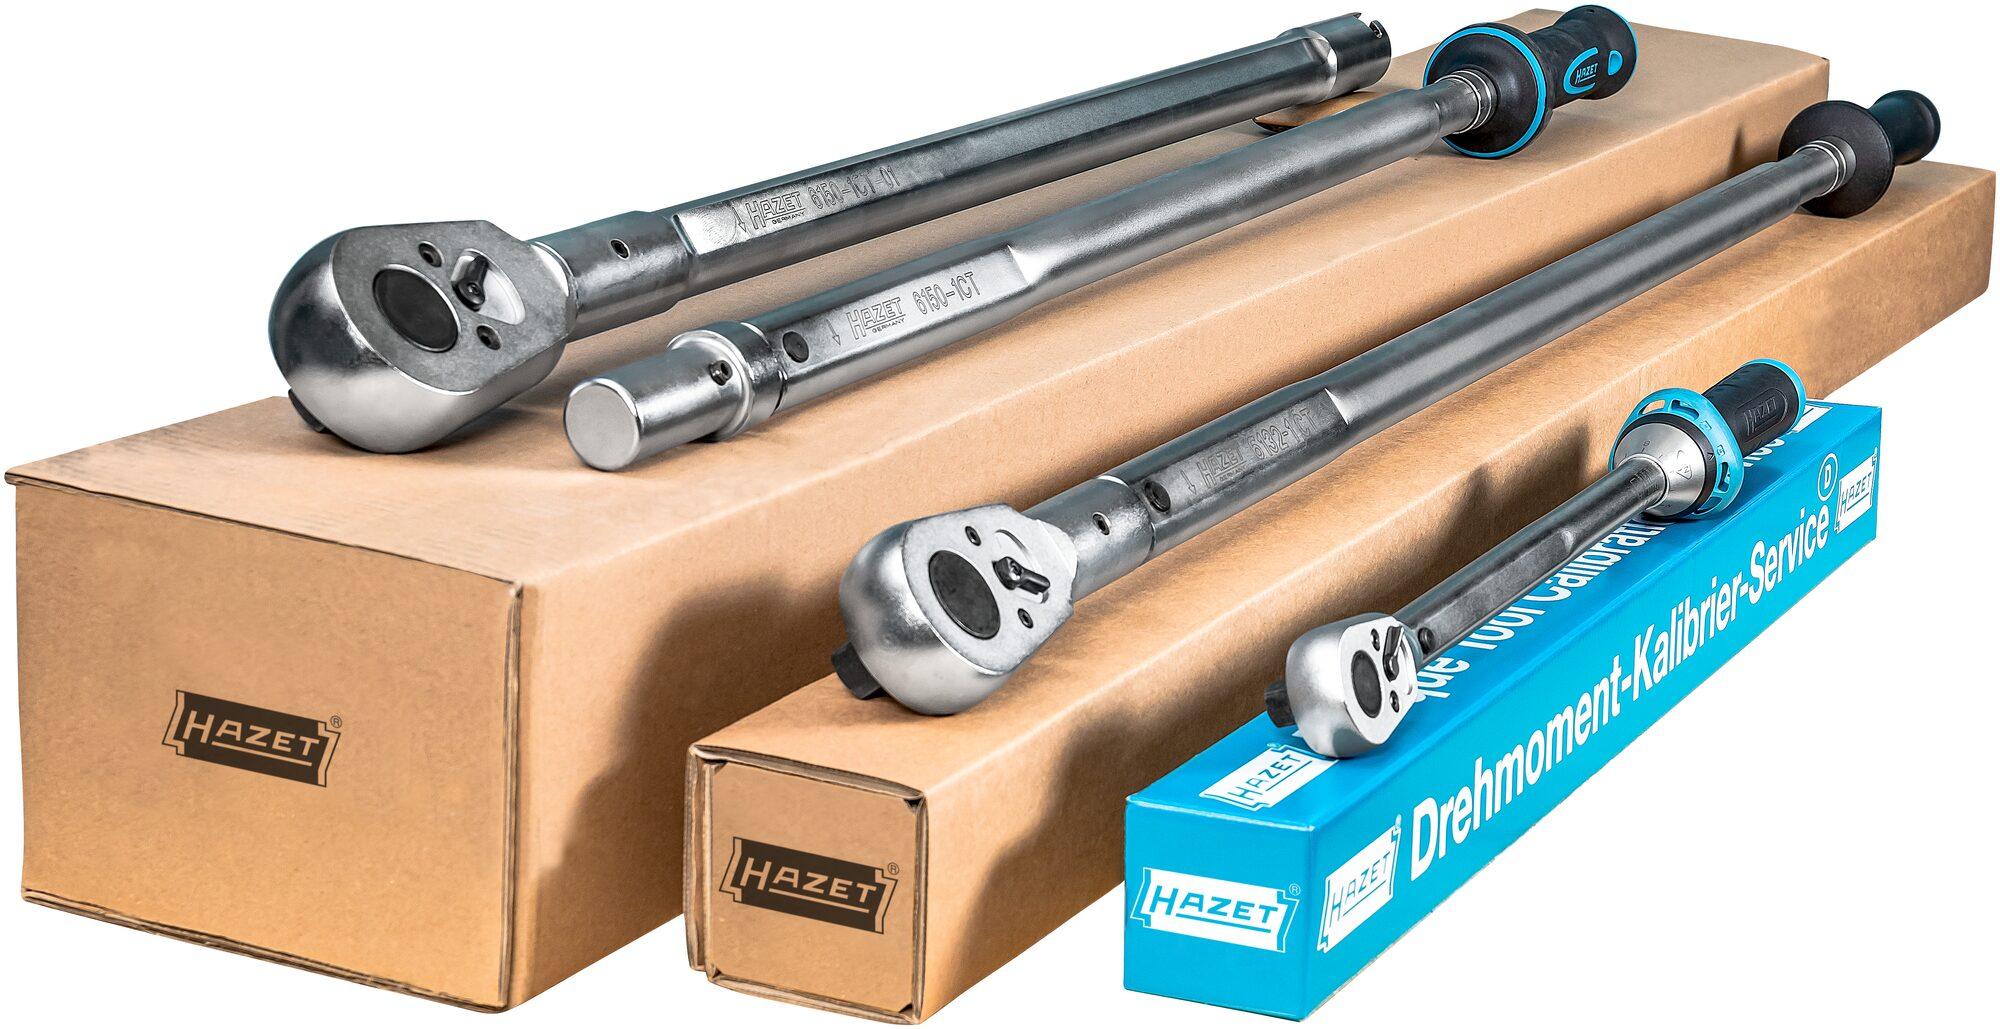 HAZET Drehmoment-Schlüssel Wartungsservice-Box SP-20